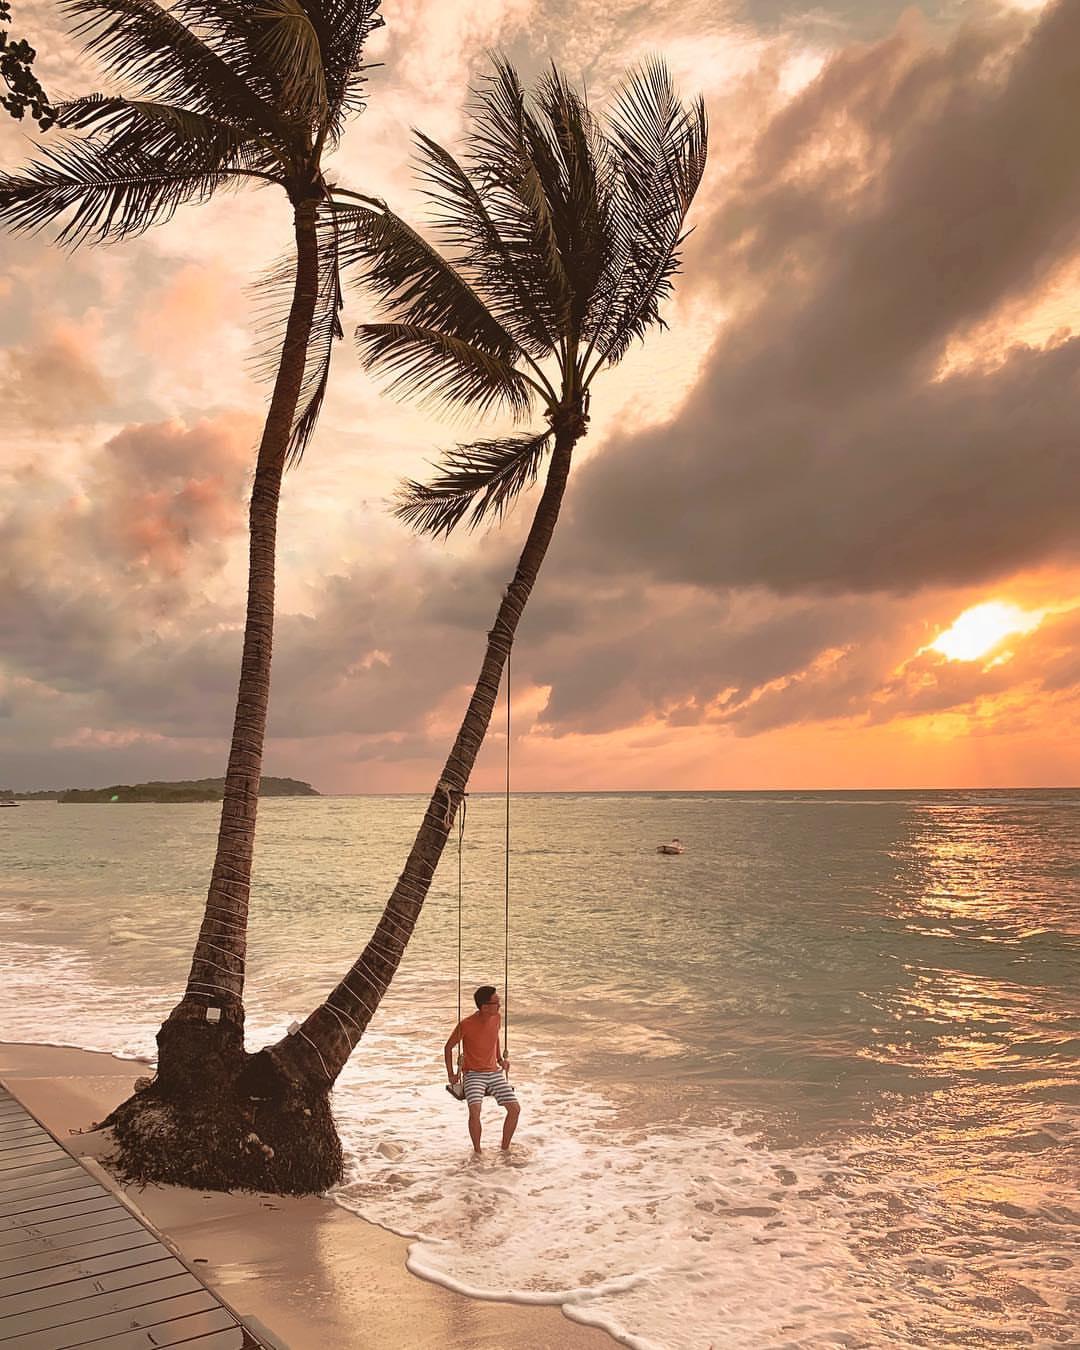 Lub d Koh Samui Chaweng Beach @davidnakamurah @tropicsbeach